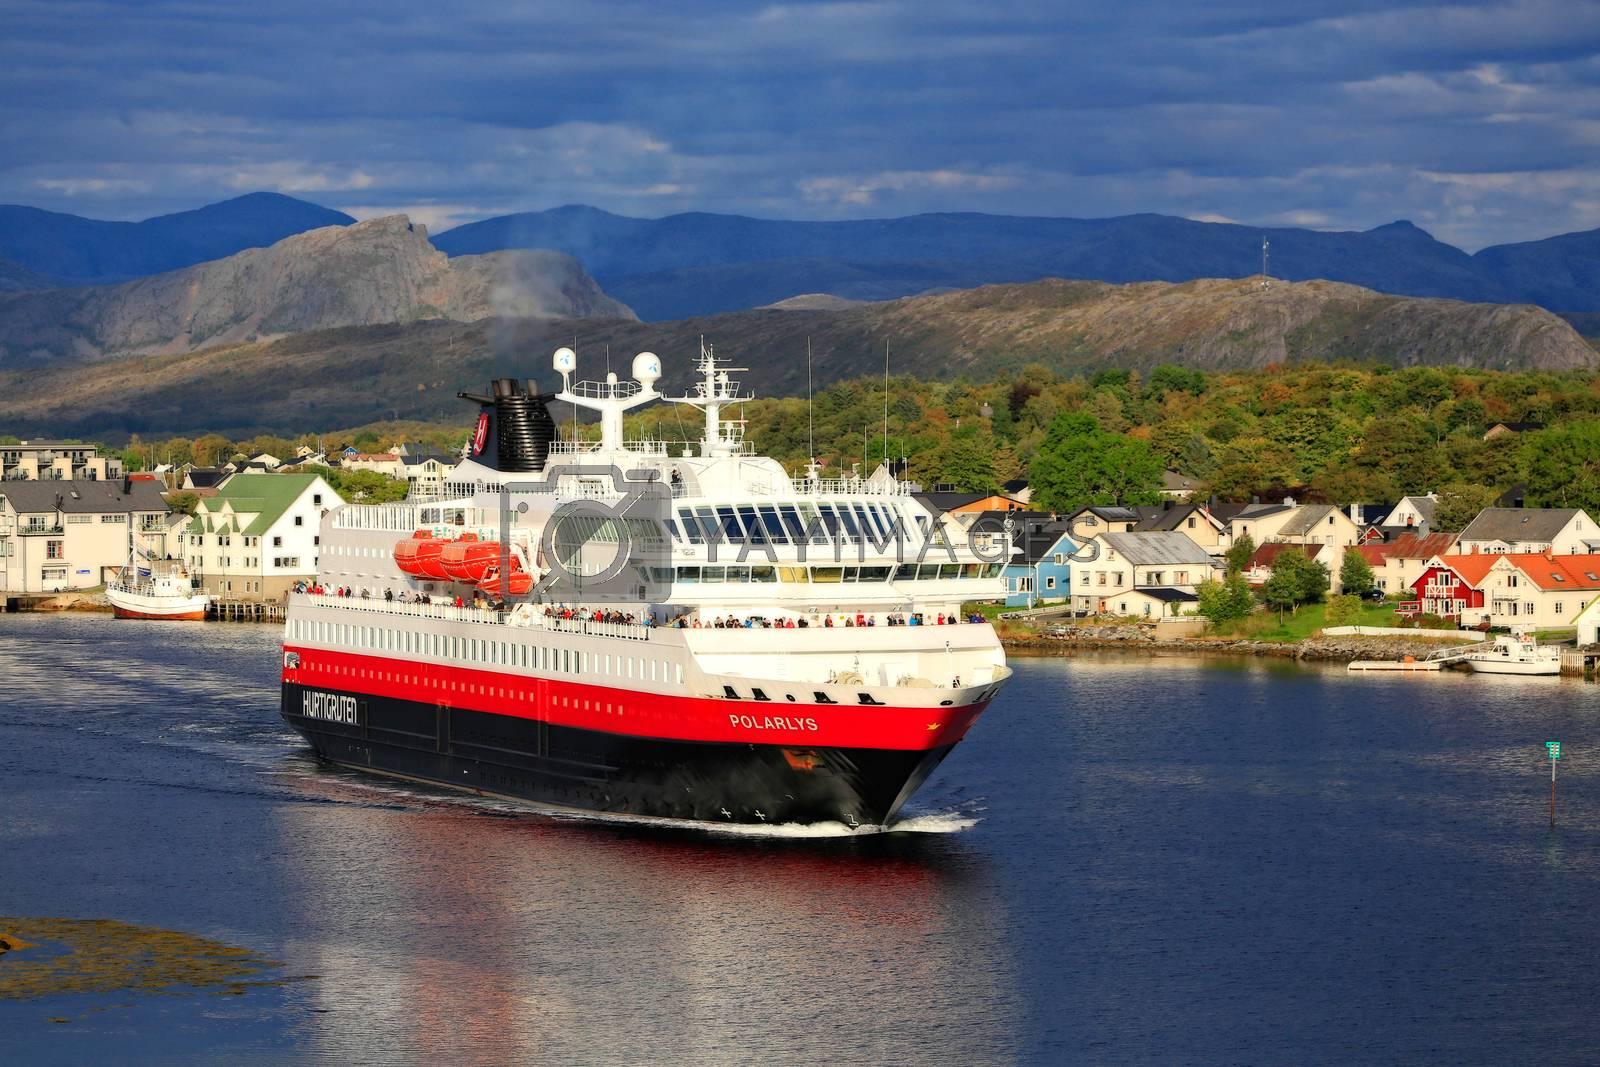 M.s Polarlys forlater brønnøysund